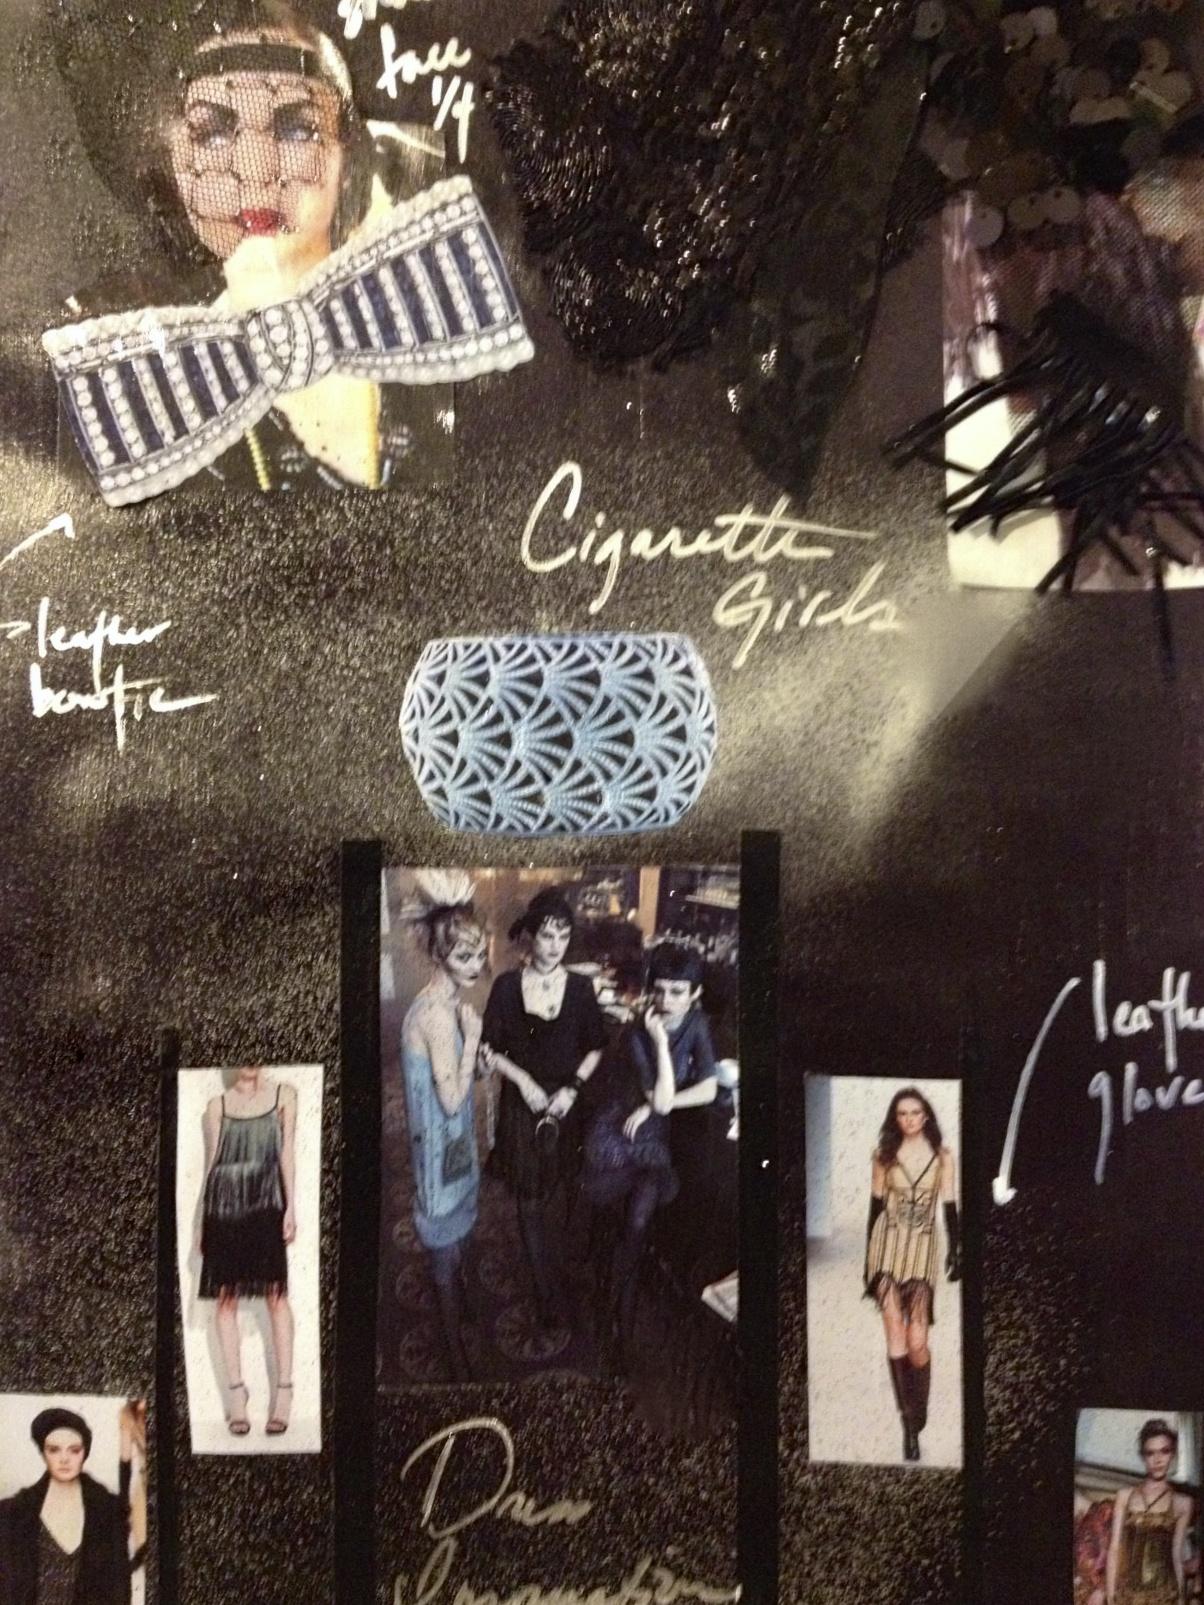 Mood board for models as cigarette girls.